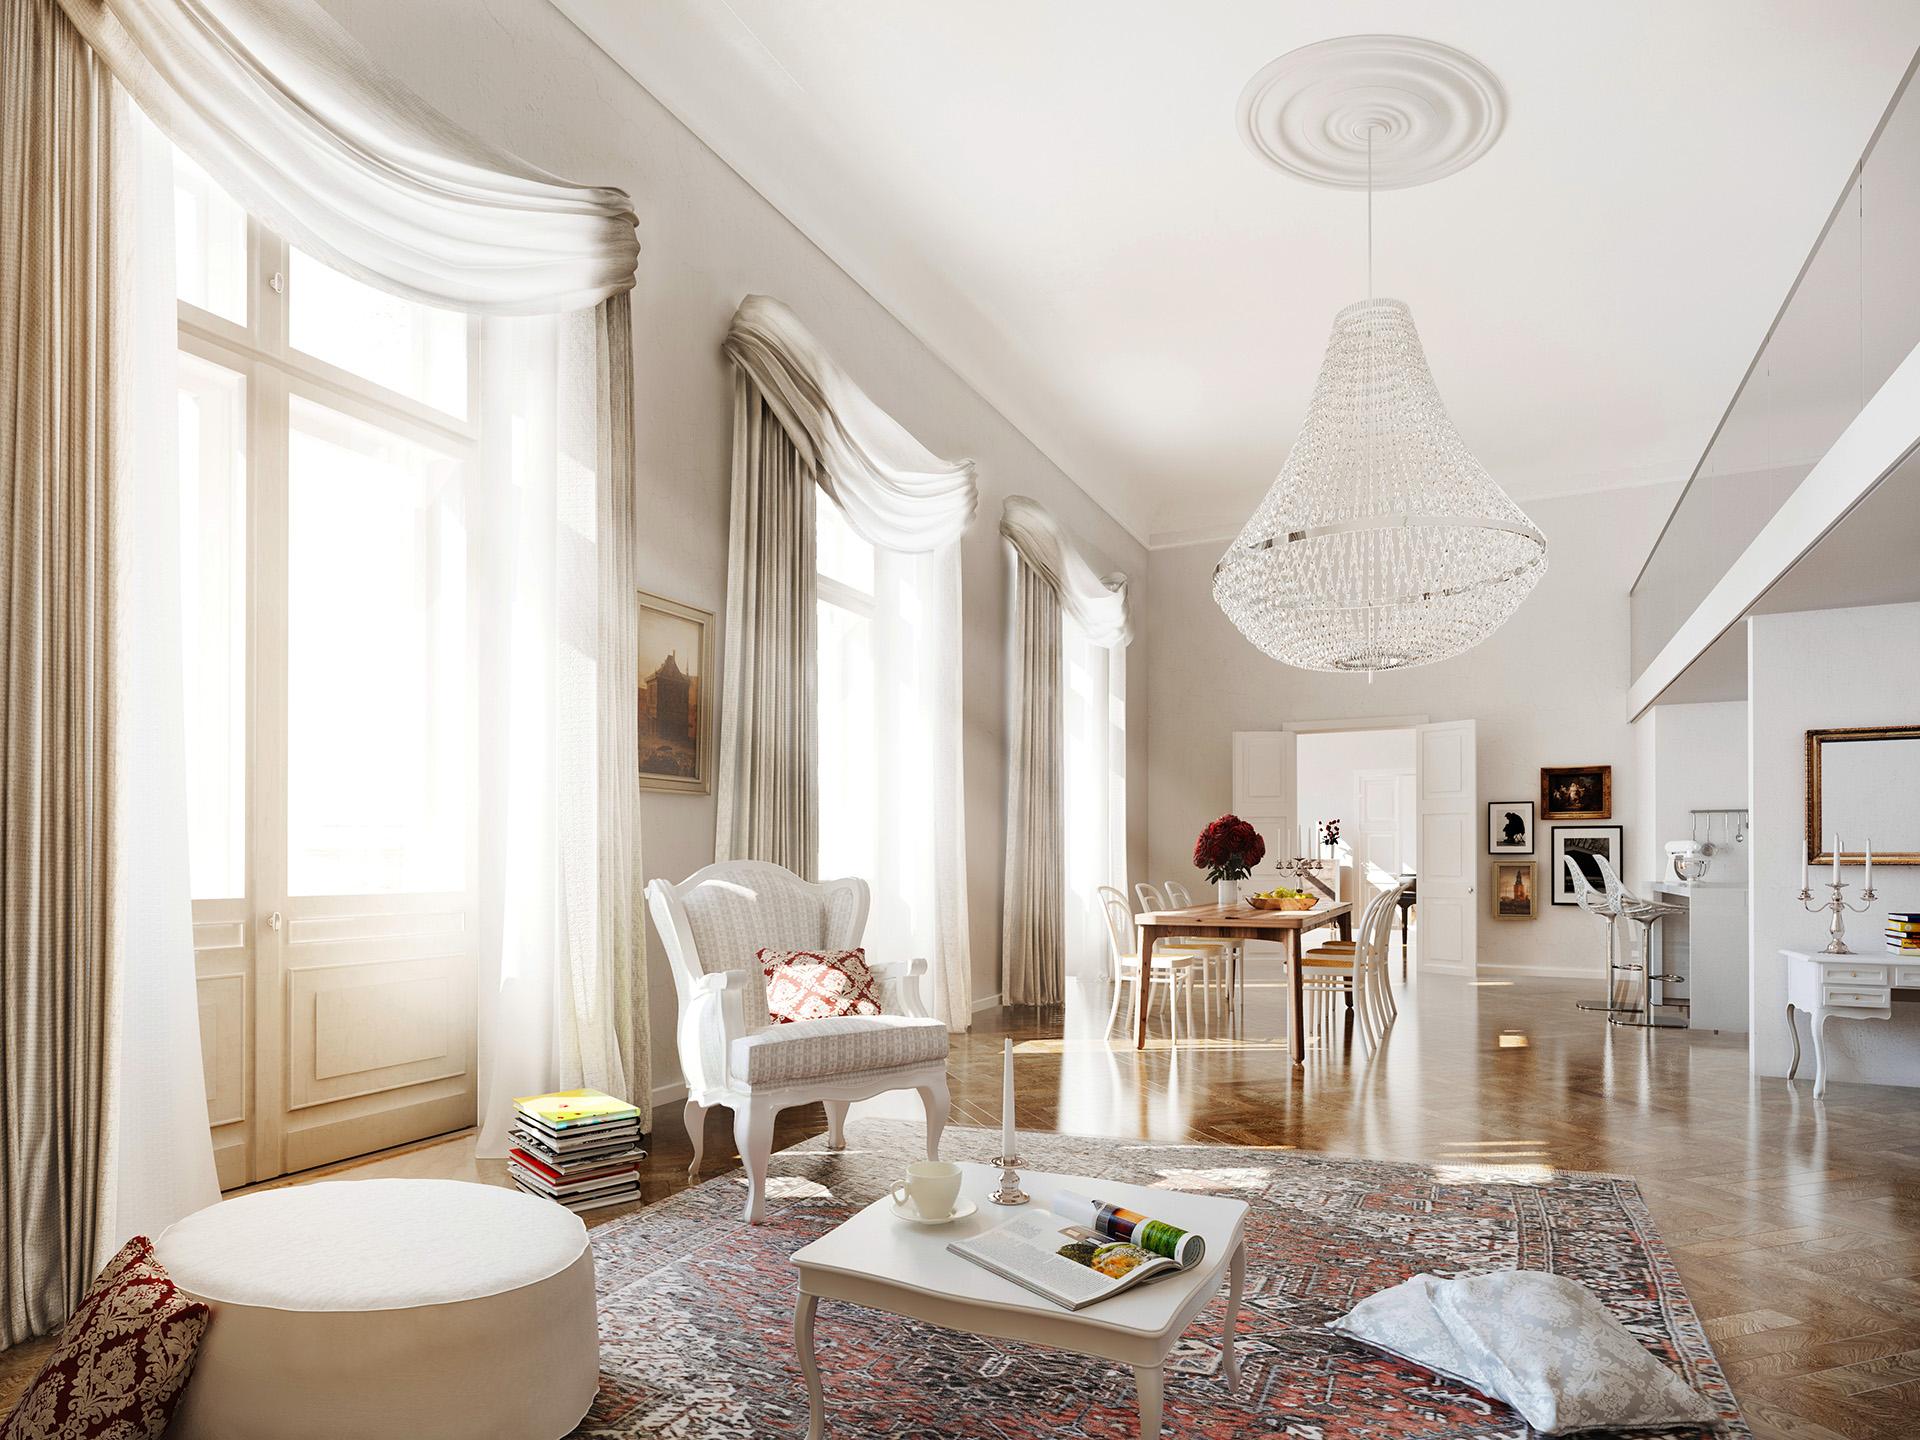 Brockessches_Palais_Saal_Interiorvisualisierung_by_xoio